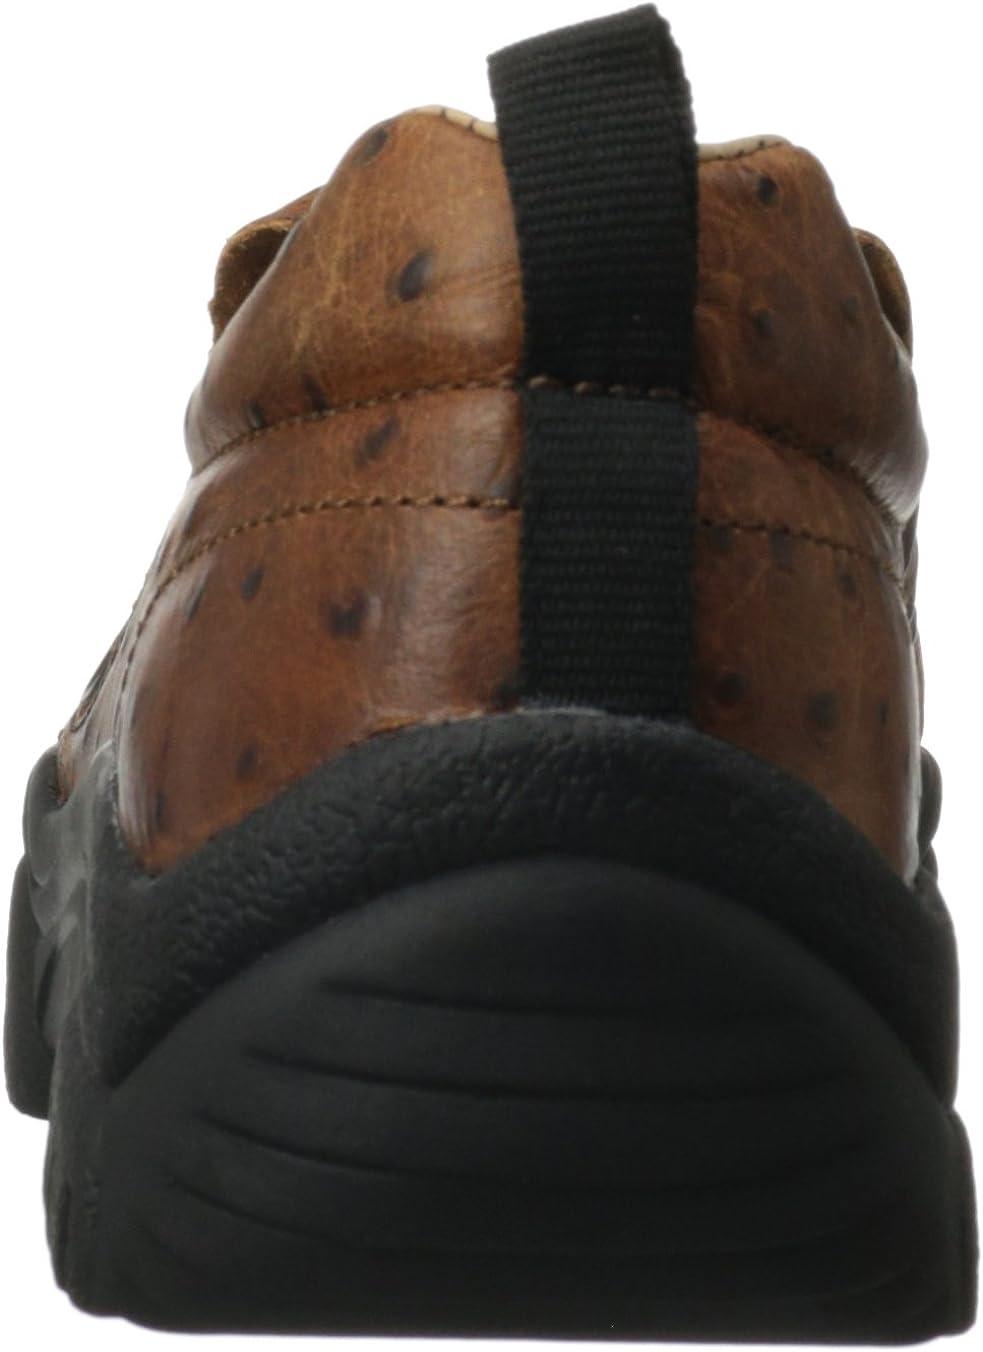 Roper Mens Performance Slip-On Casual Western Shoe